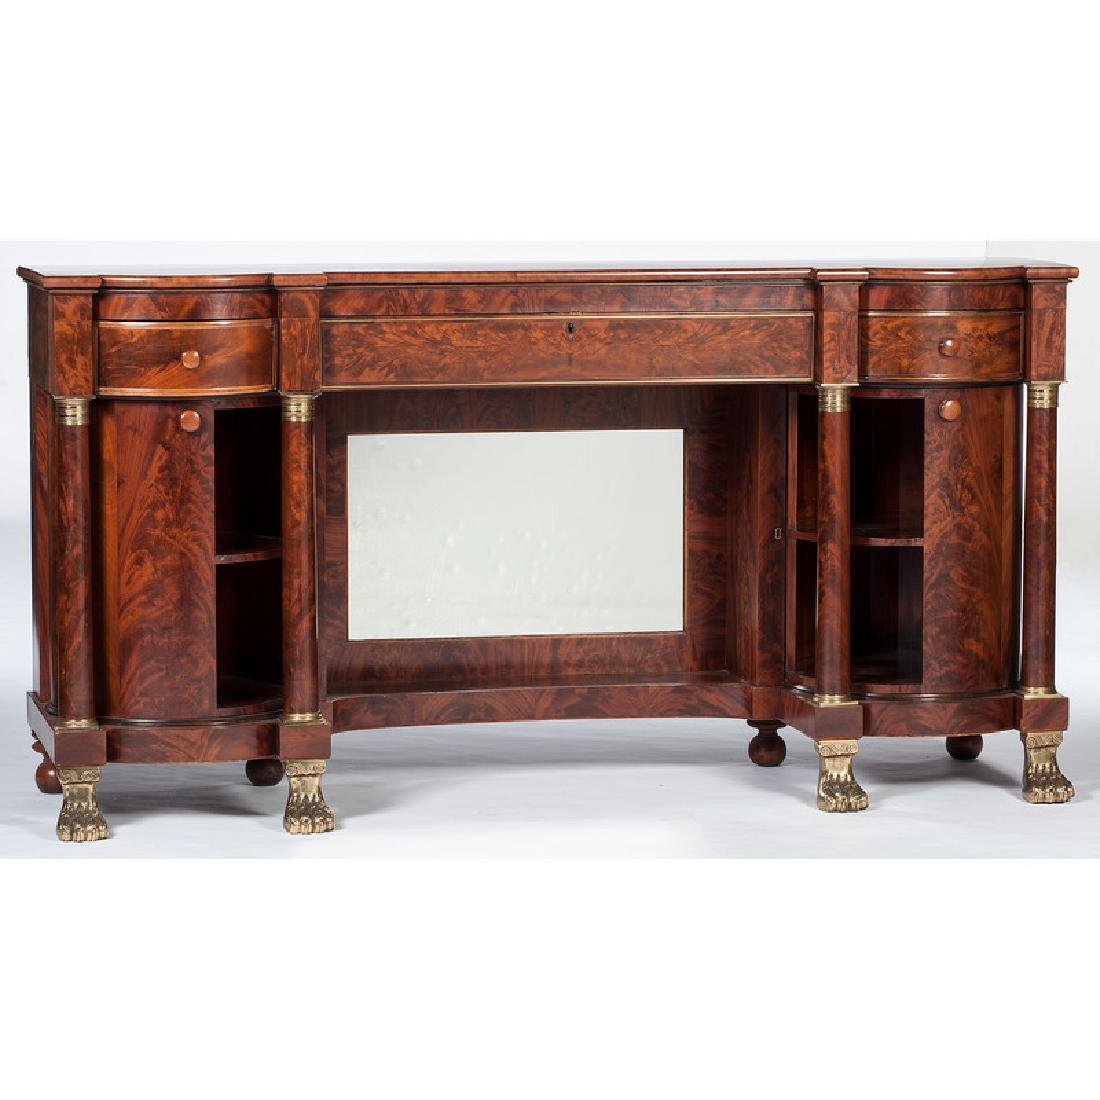 American Late Classical Sideboard - 2